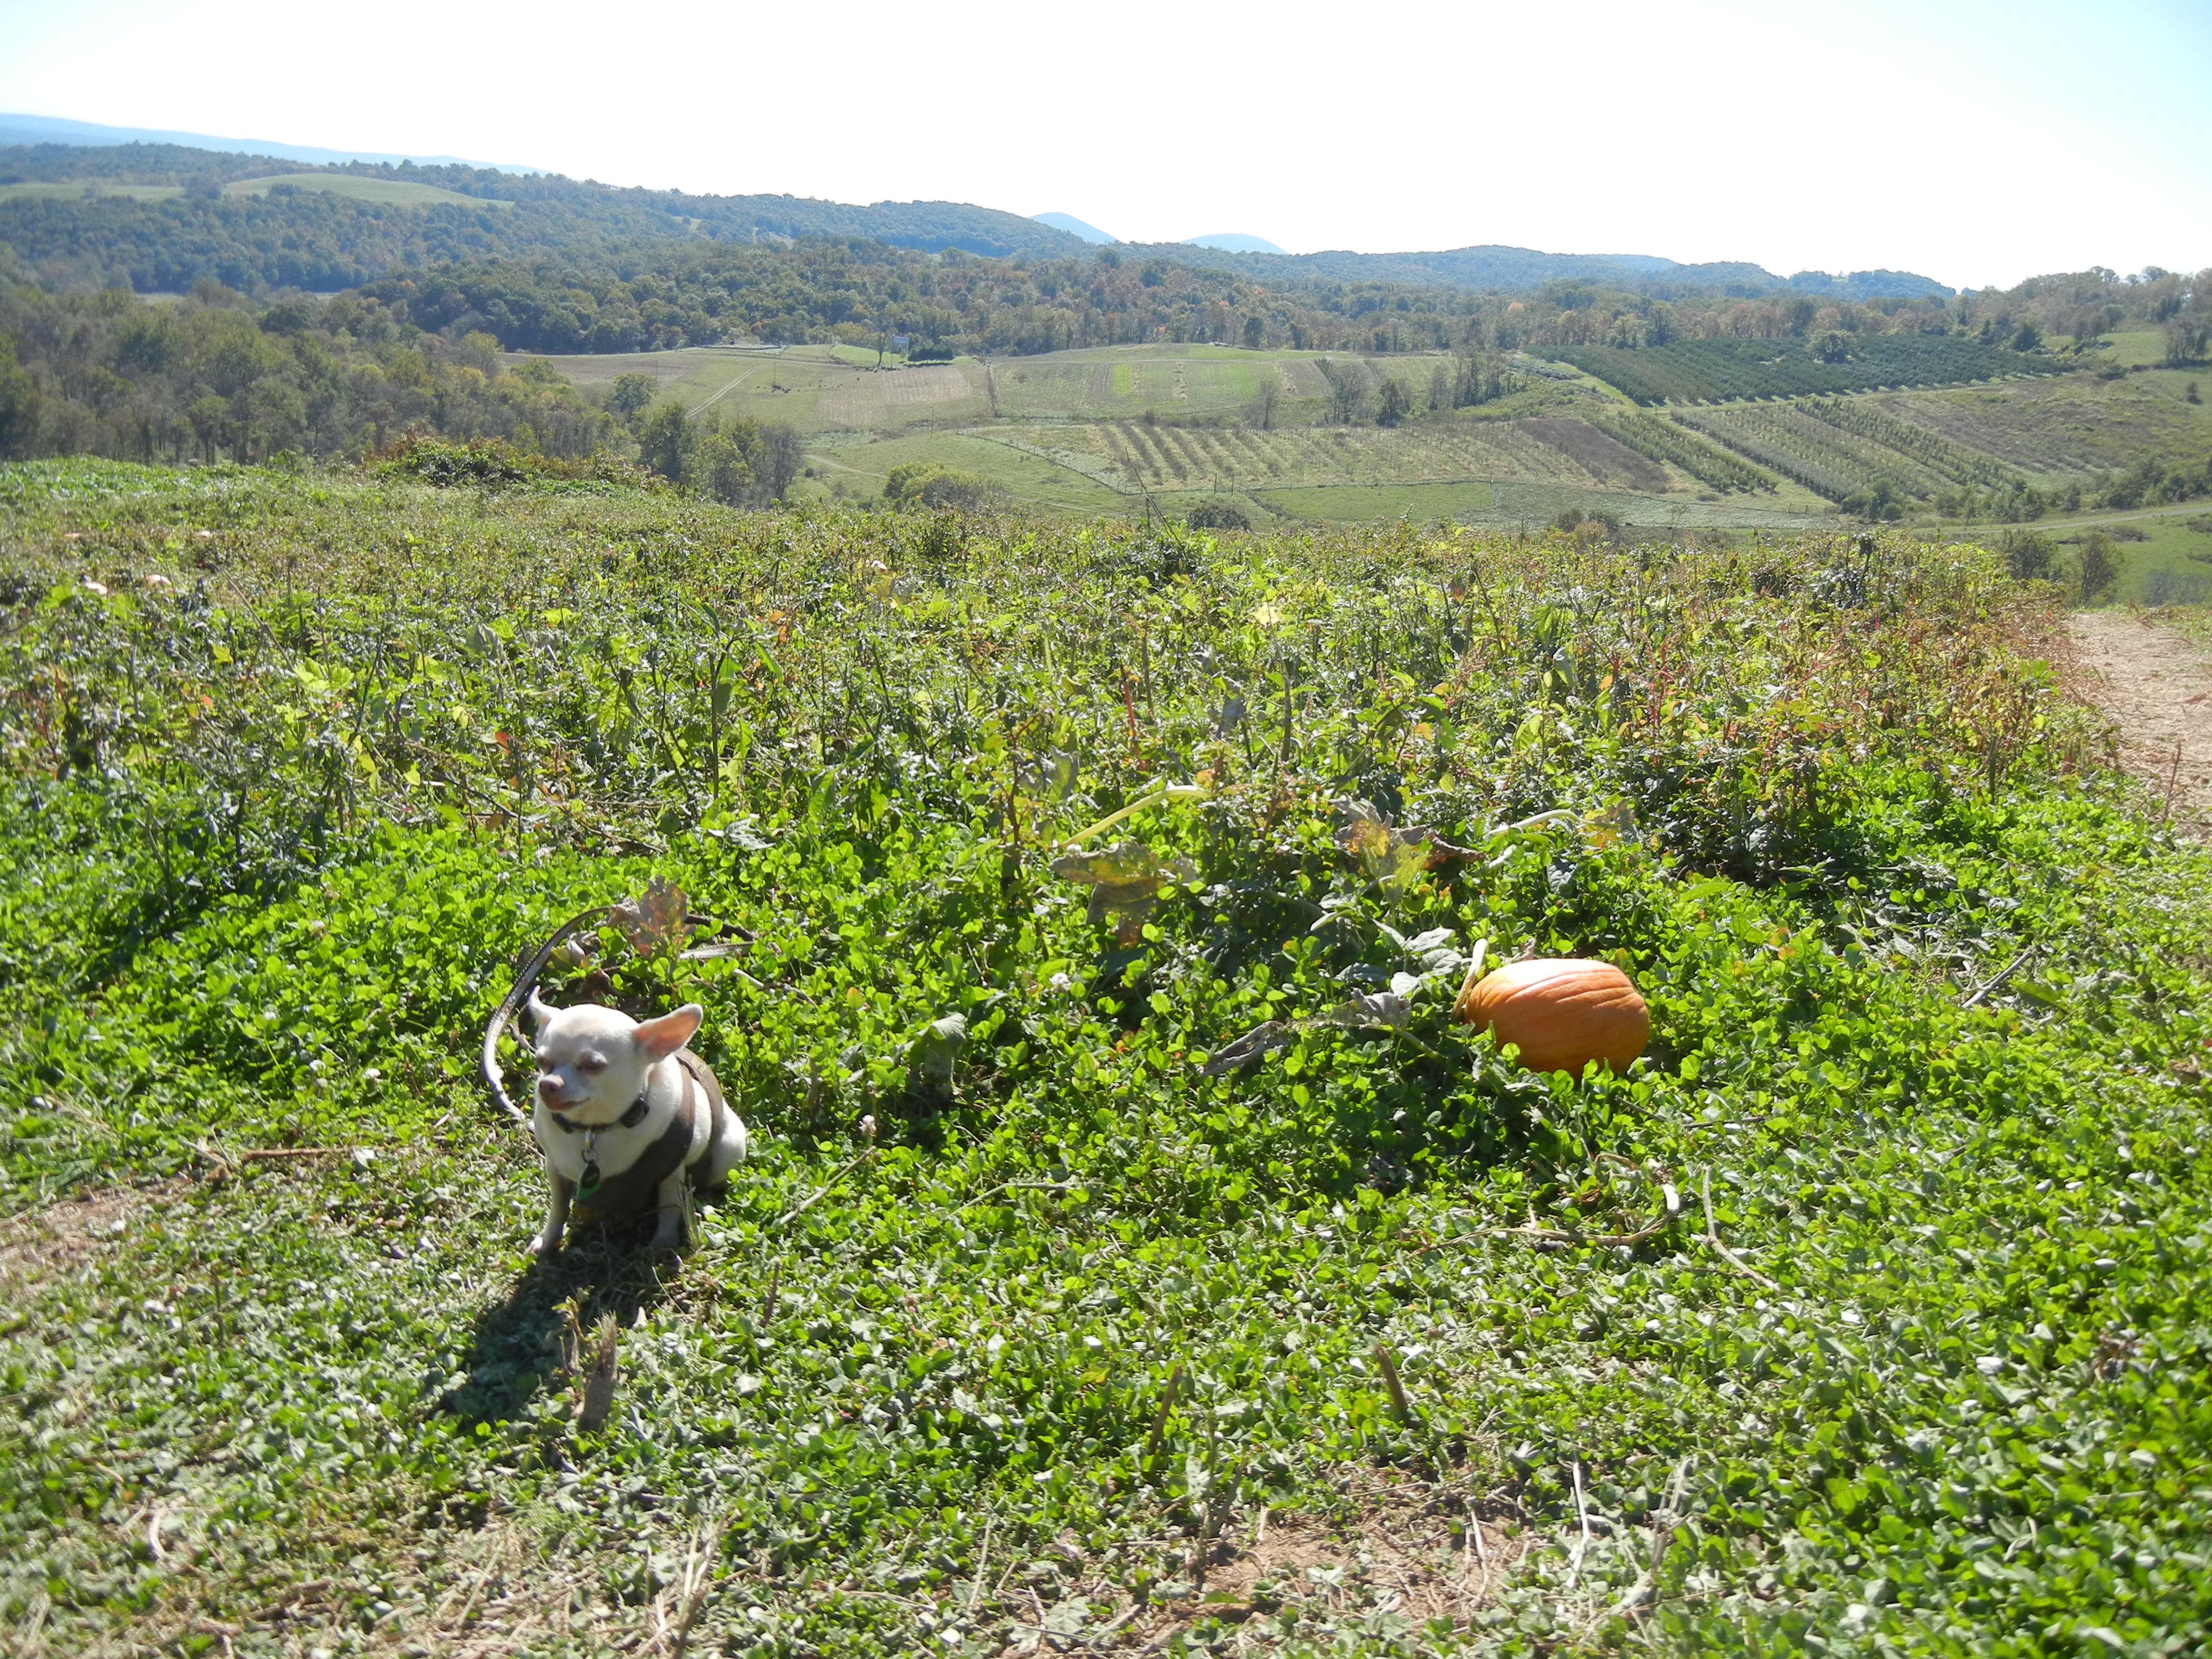 Junior's pumpkin